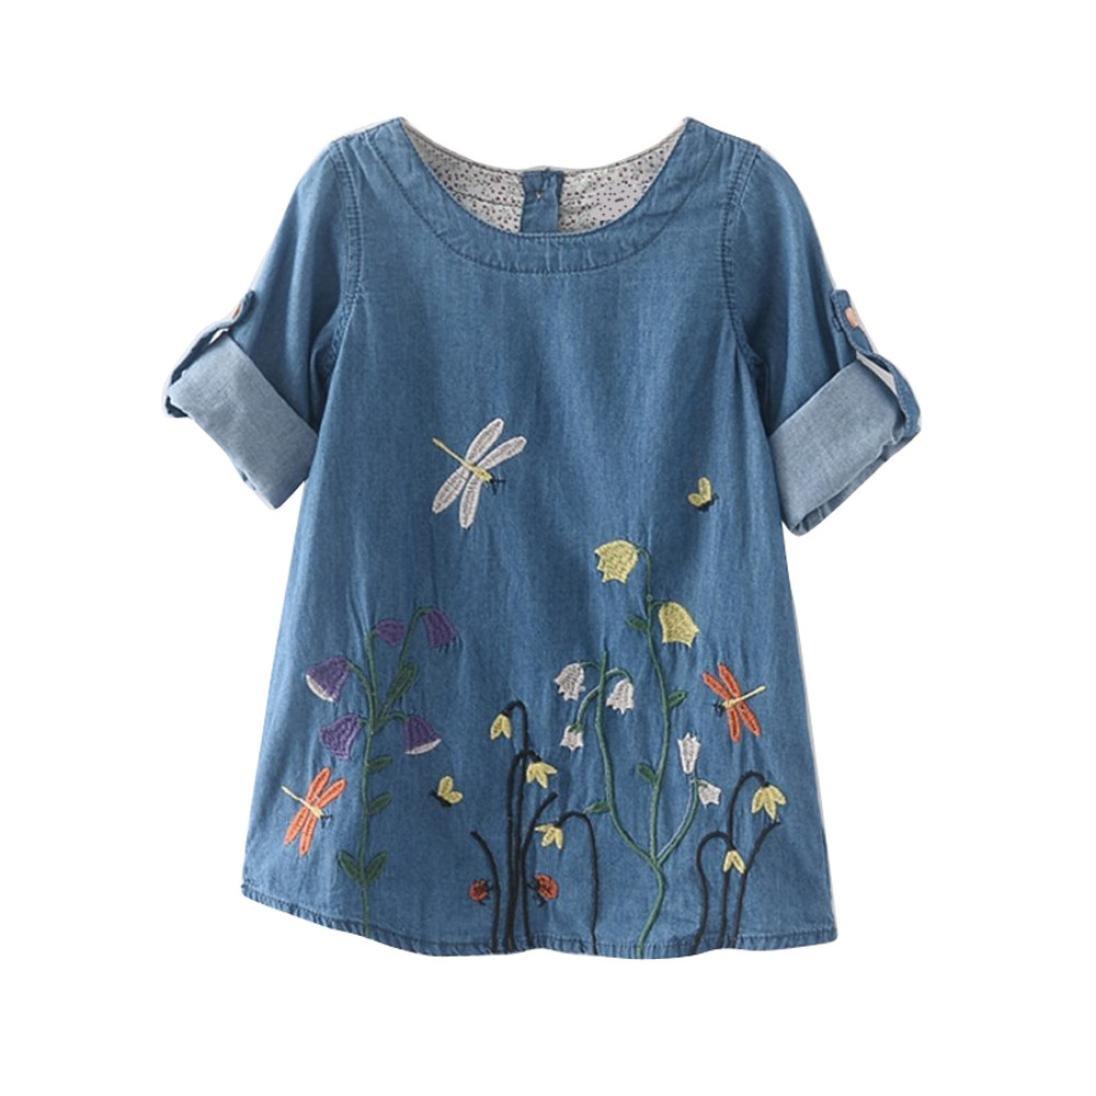 xilaluキッズ赤ちゃん女の子ドレスフラワー刺繍デニムプリンセス服 4-5 Years ライトブルー B06XRFW69S